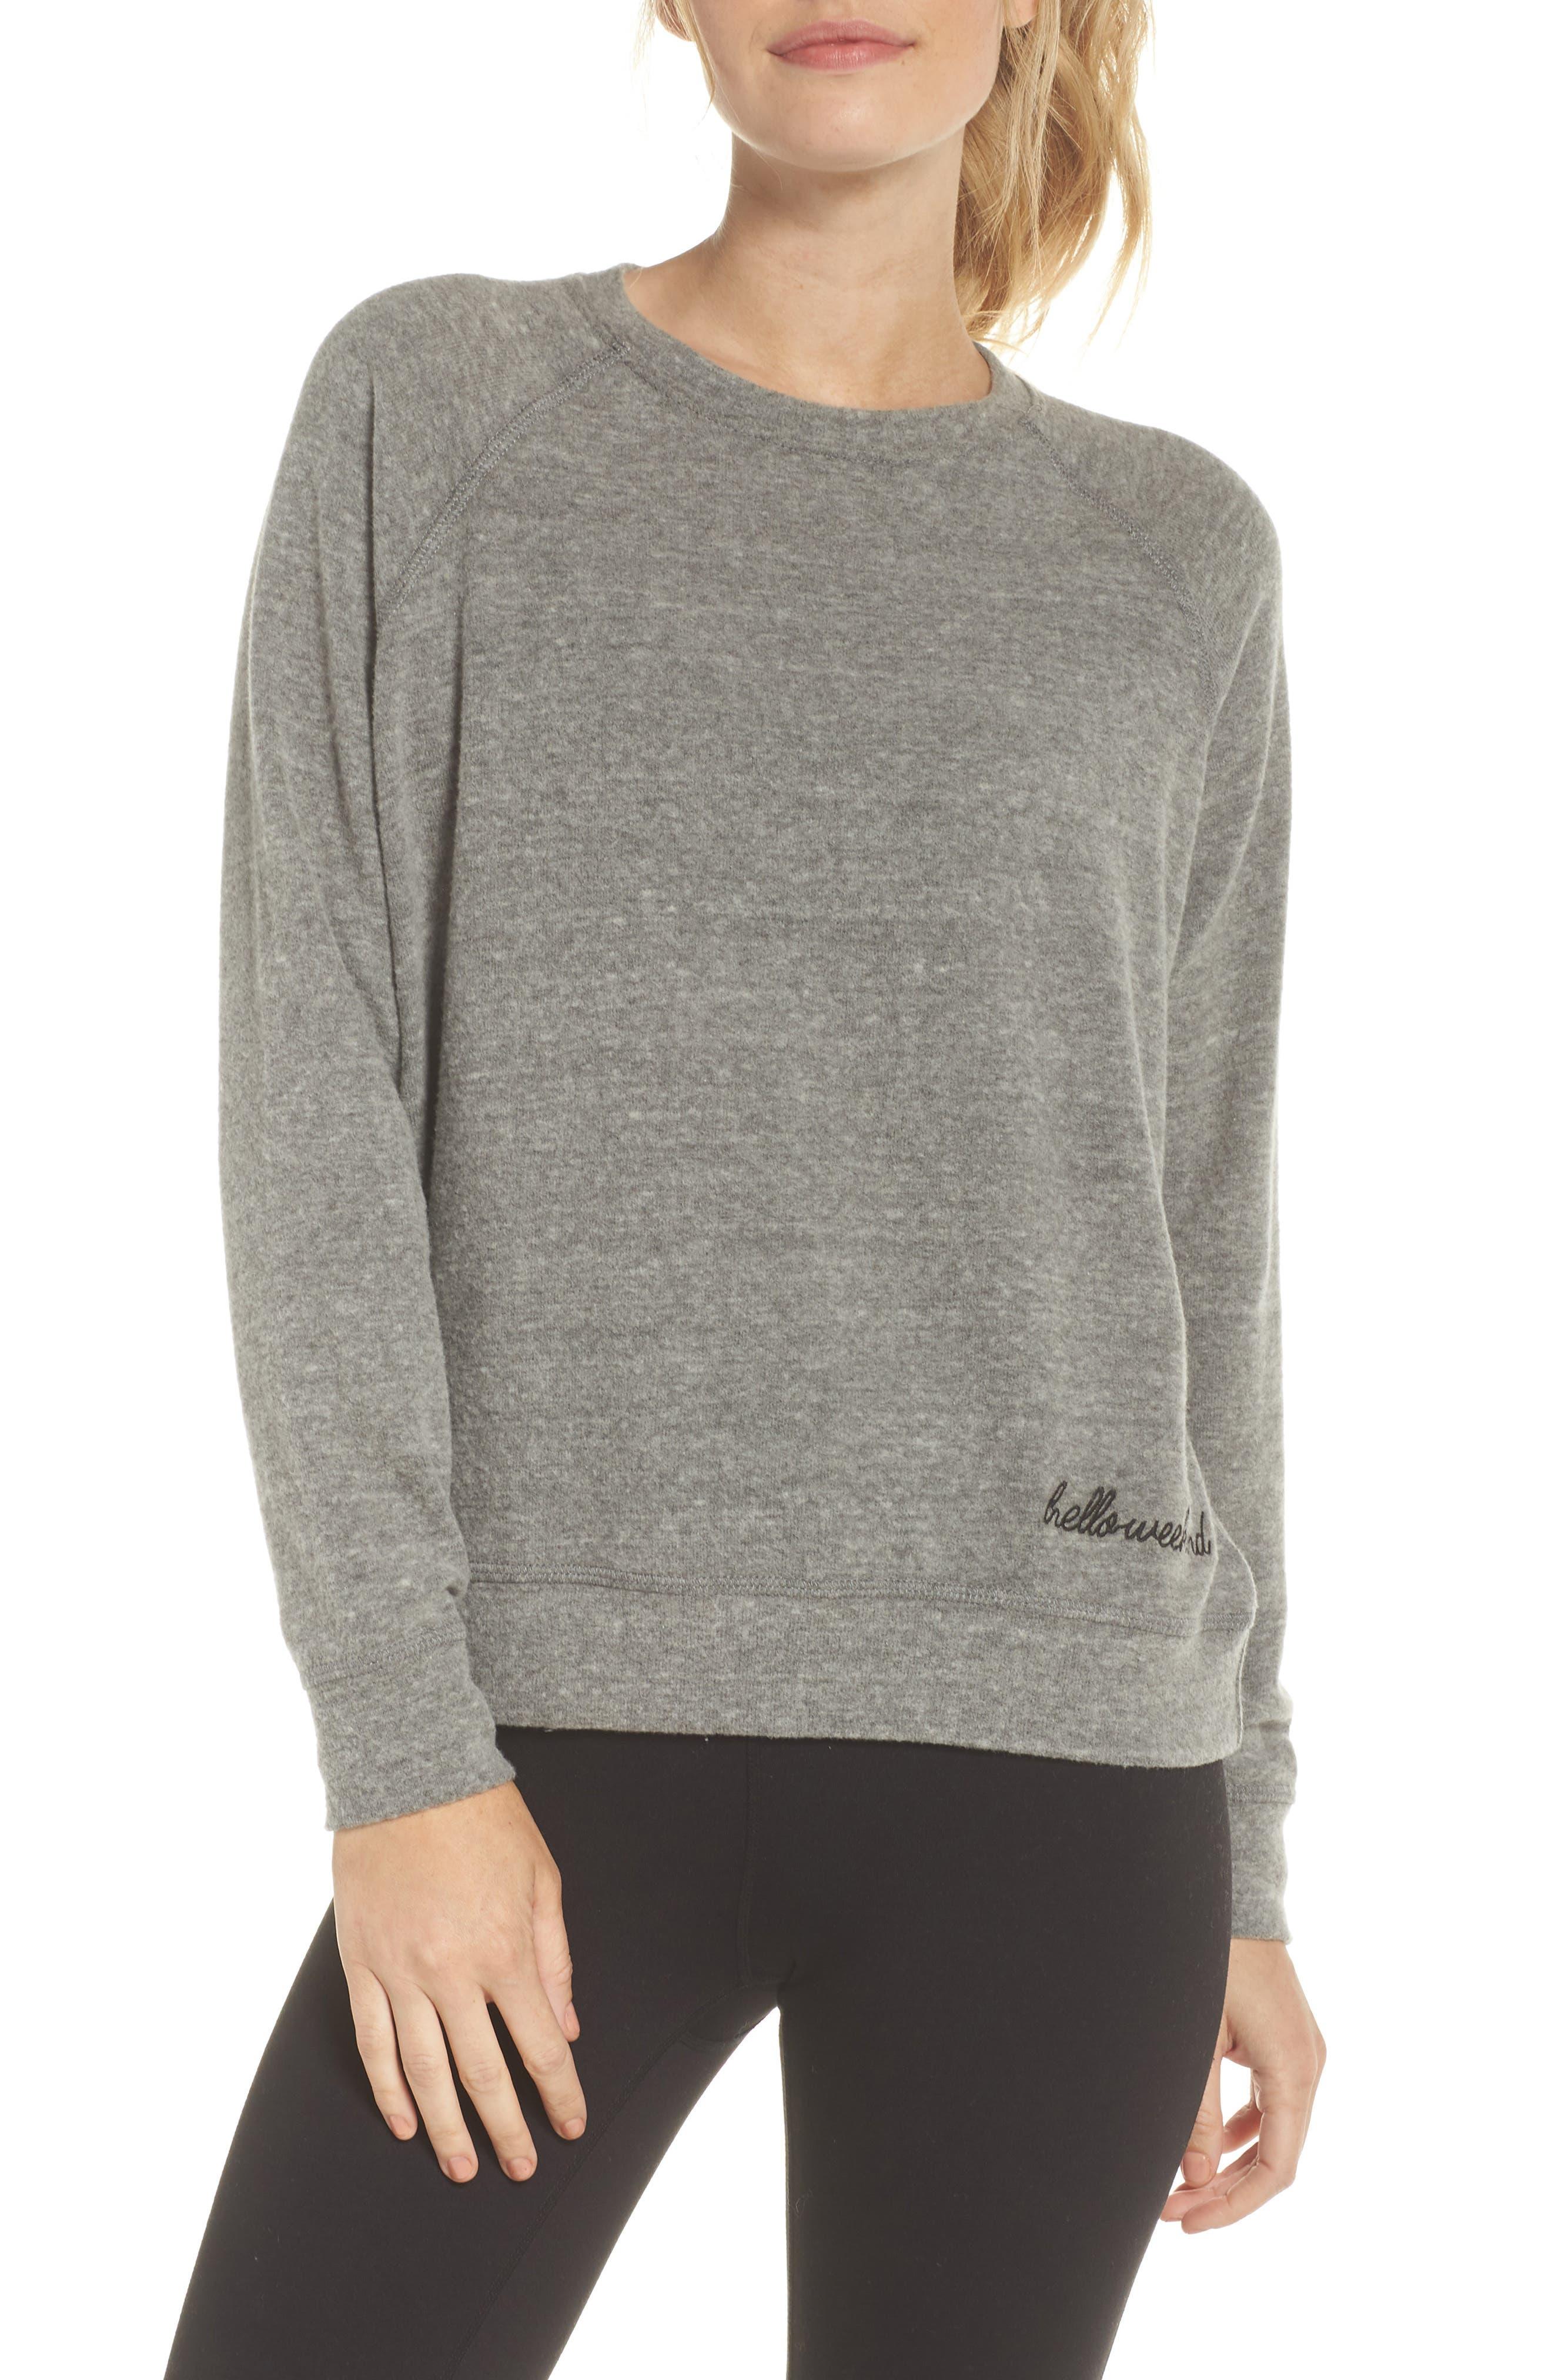 Roselynn Hello, Weekend Sweatshirt,                         Main,                         color, 020